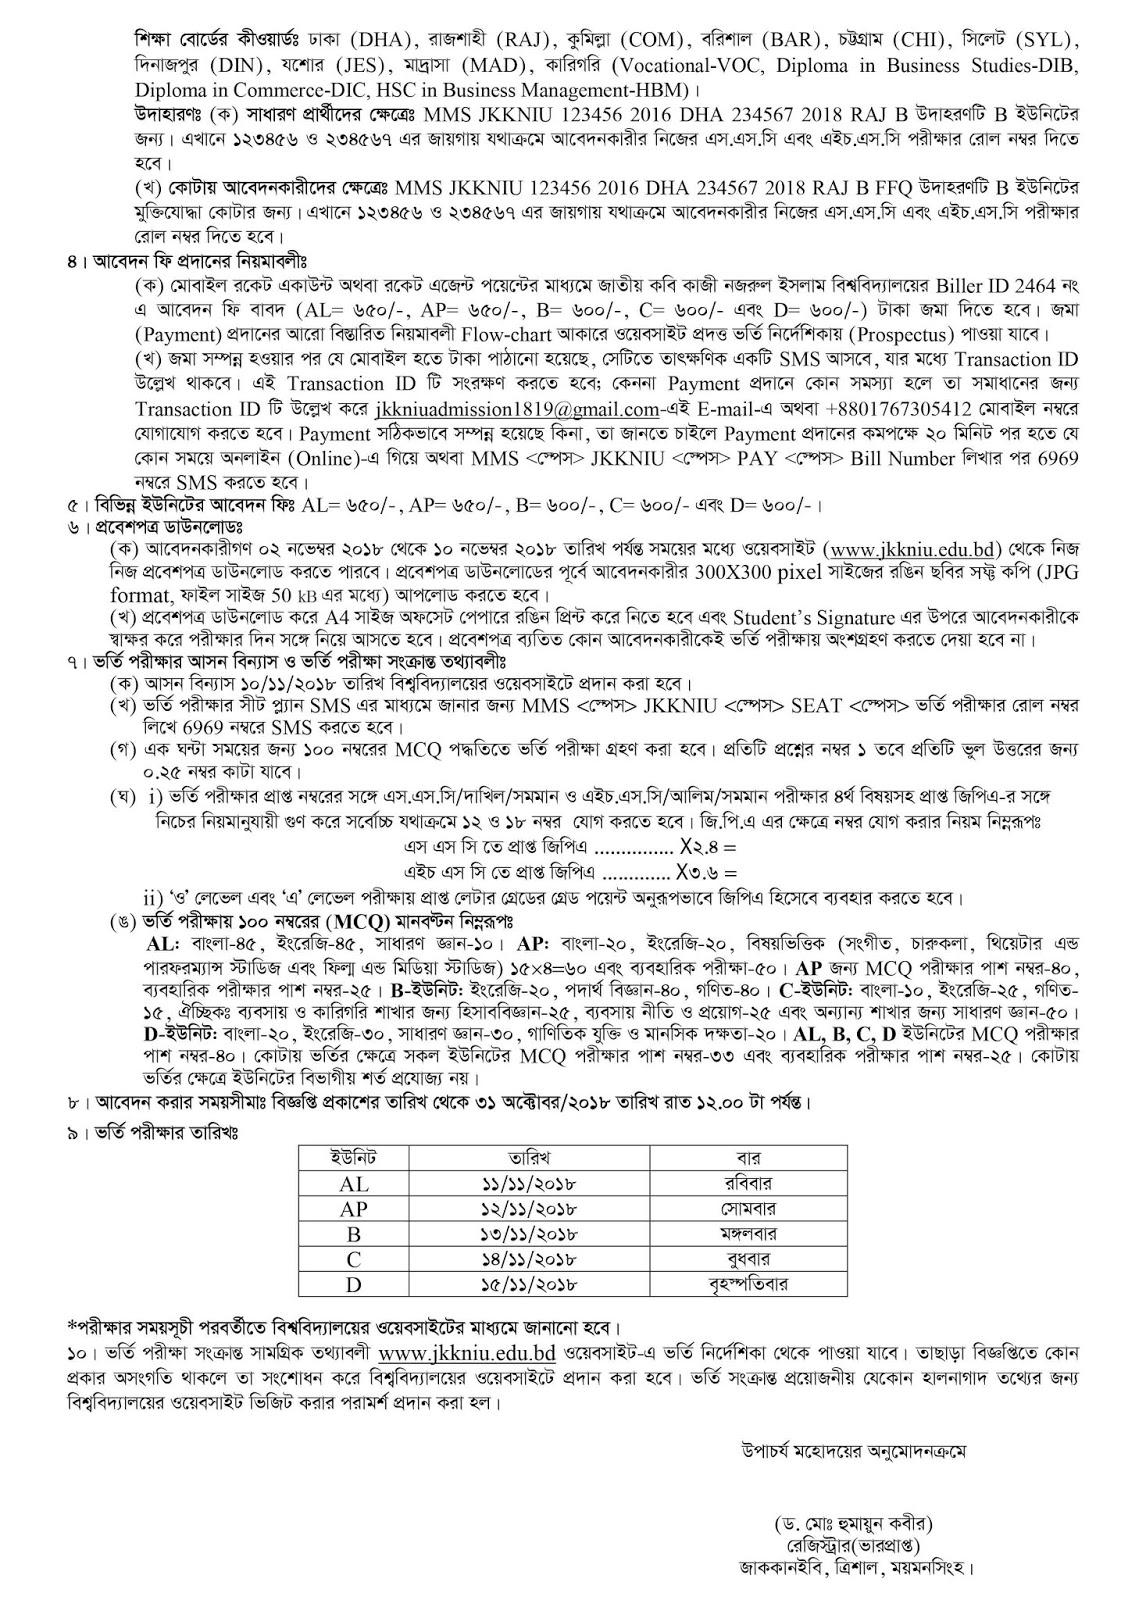 Jatiya Kabi Kazi Nazrul Islam University (JKKNIU) Admission Circular 2018-2019